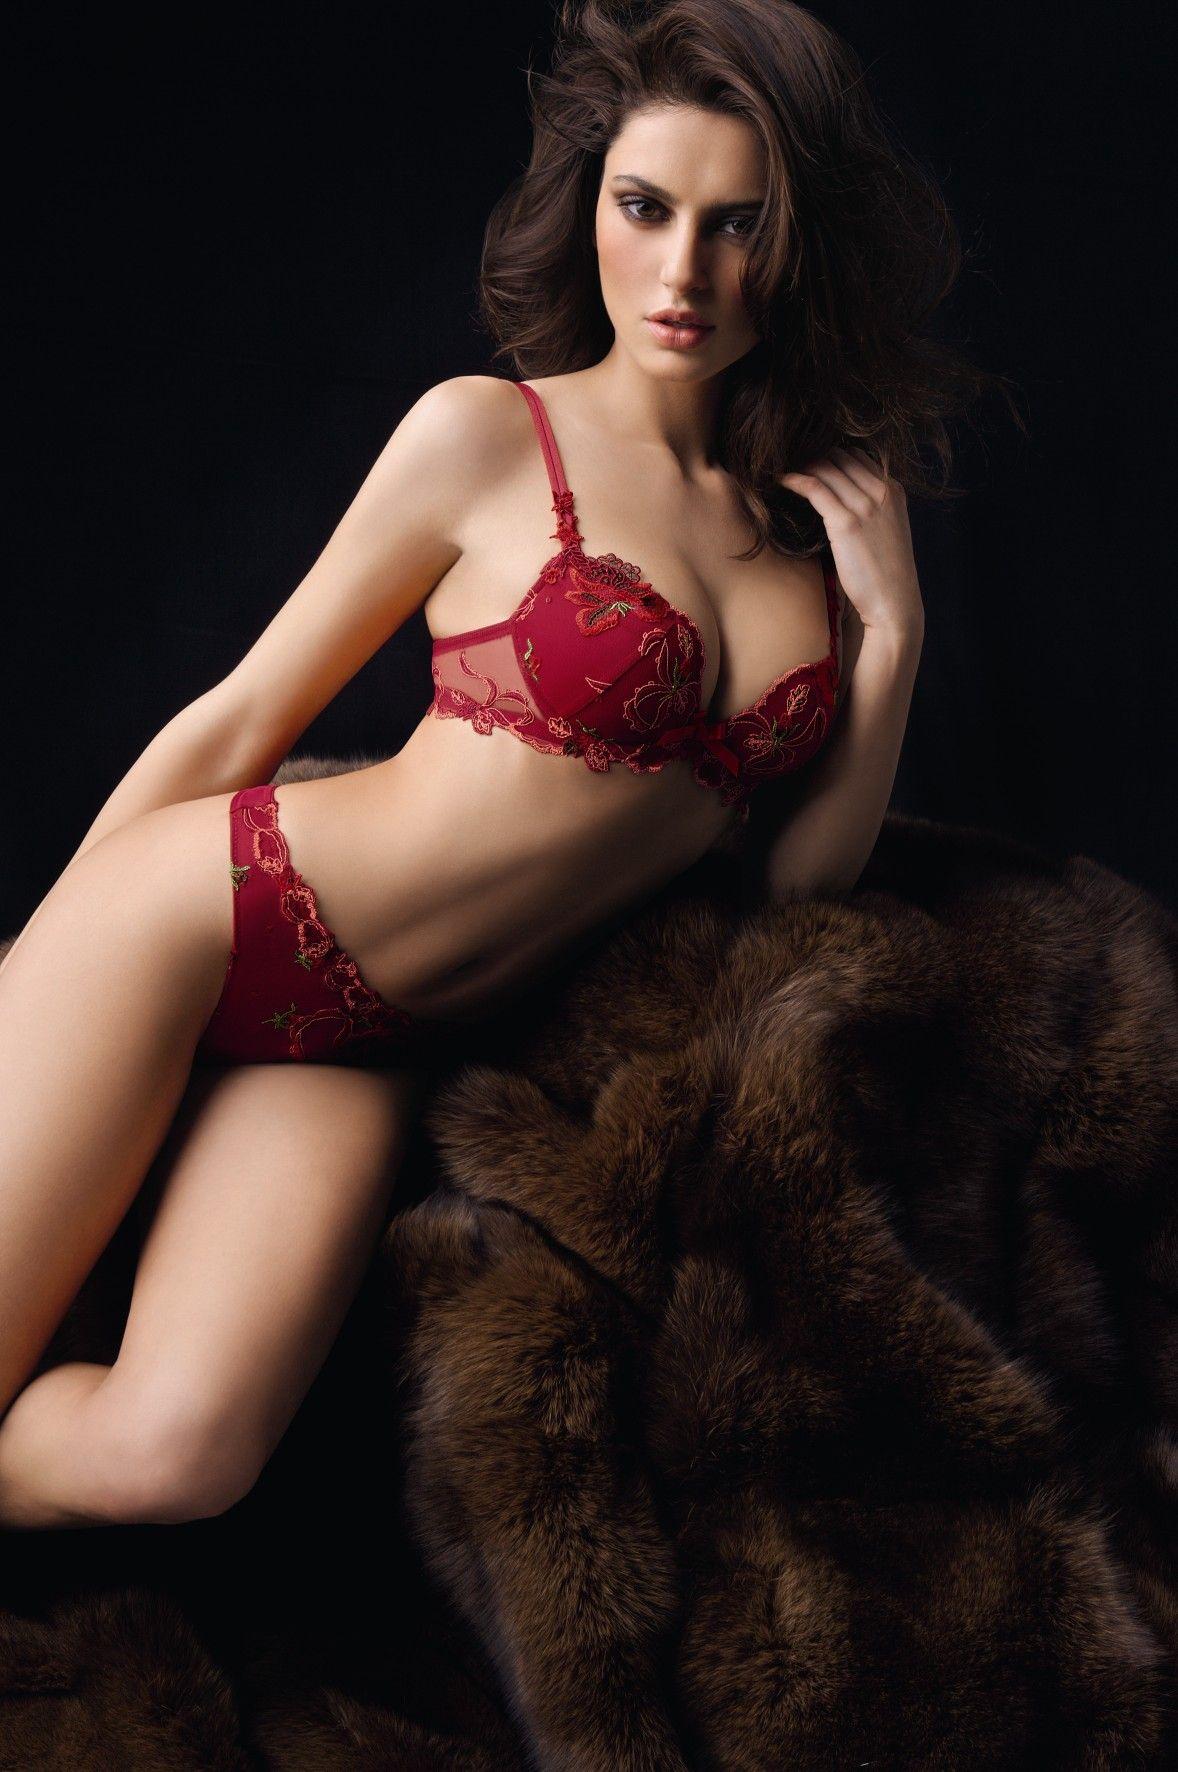 Leaked Catrinel Menghia nude photos 2019